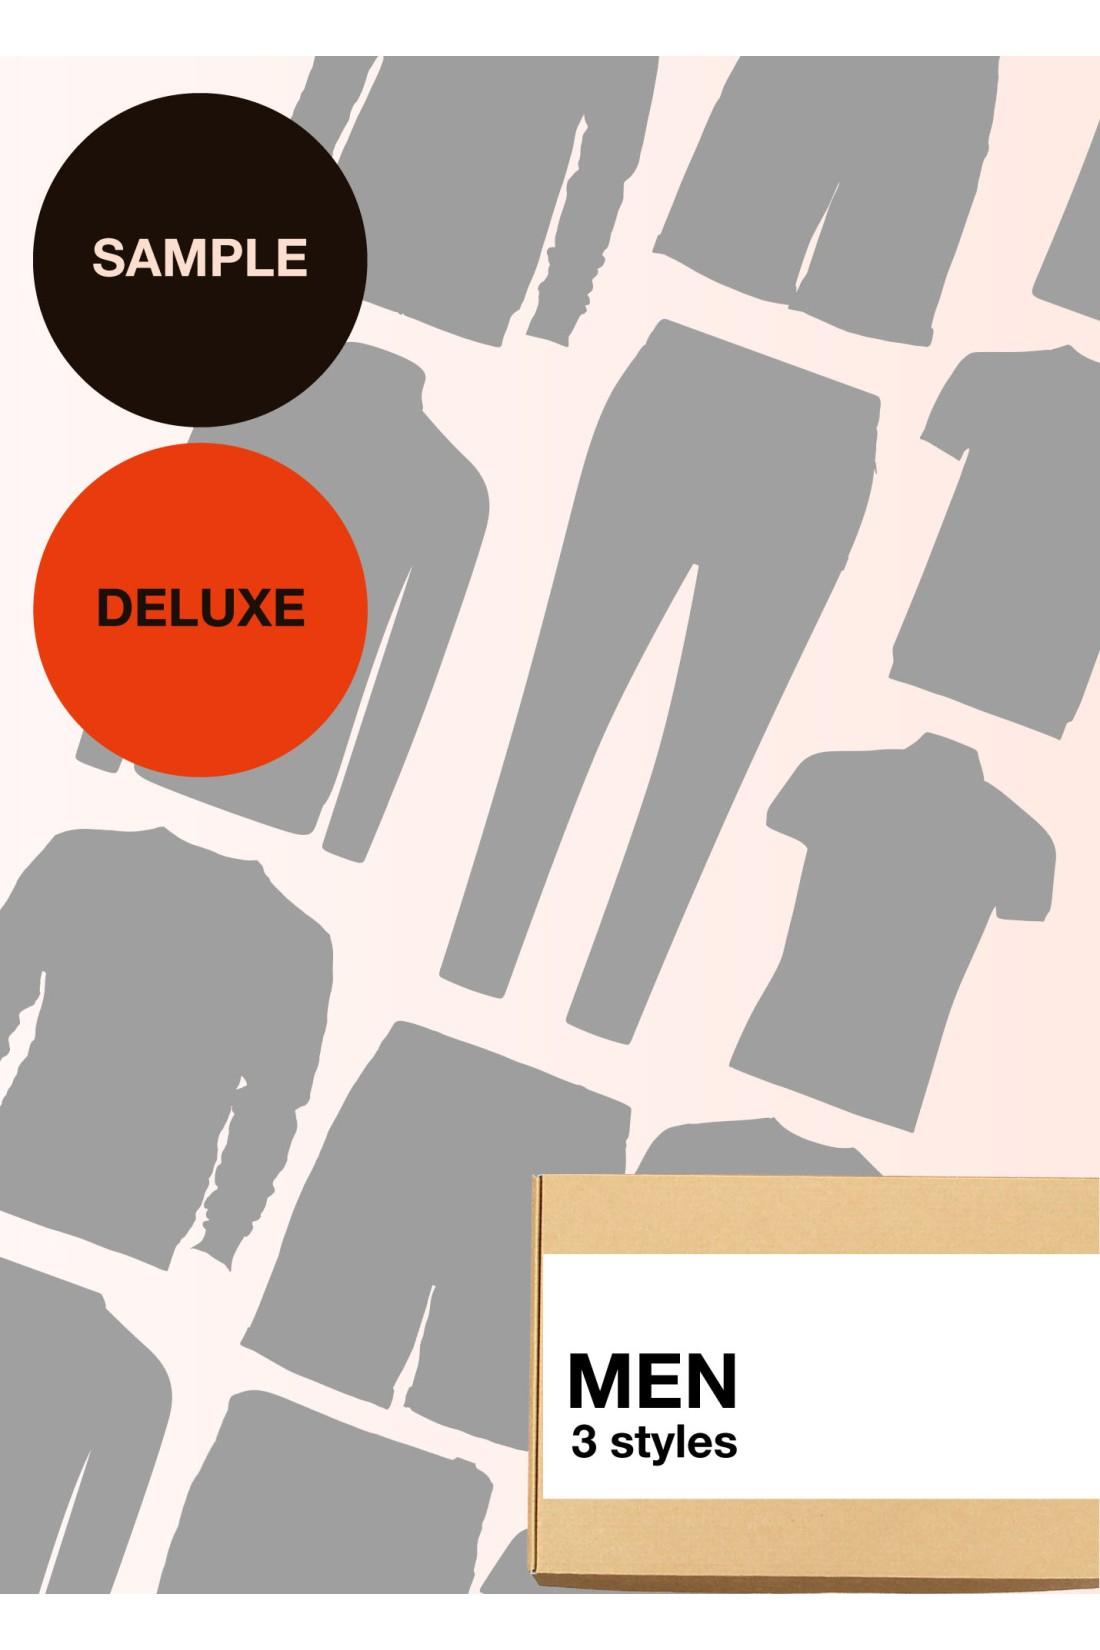 Sample Surprise Box Men Deluxe - 3 Styles